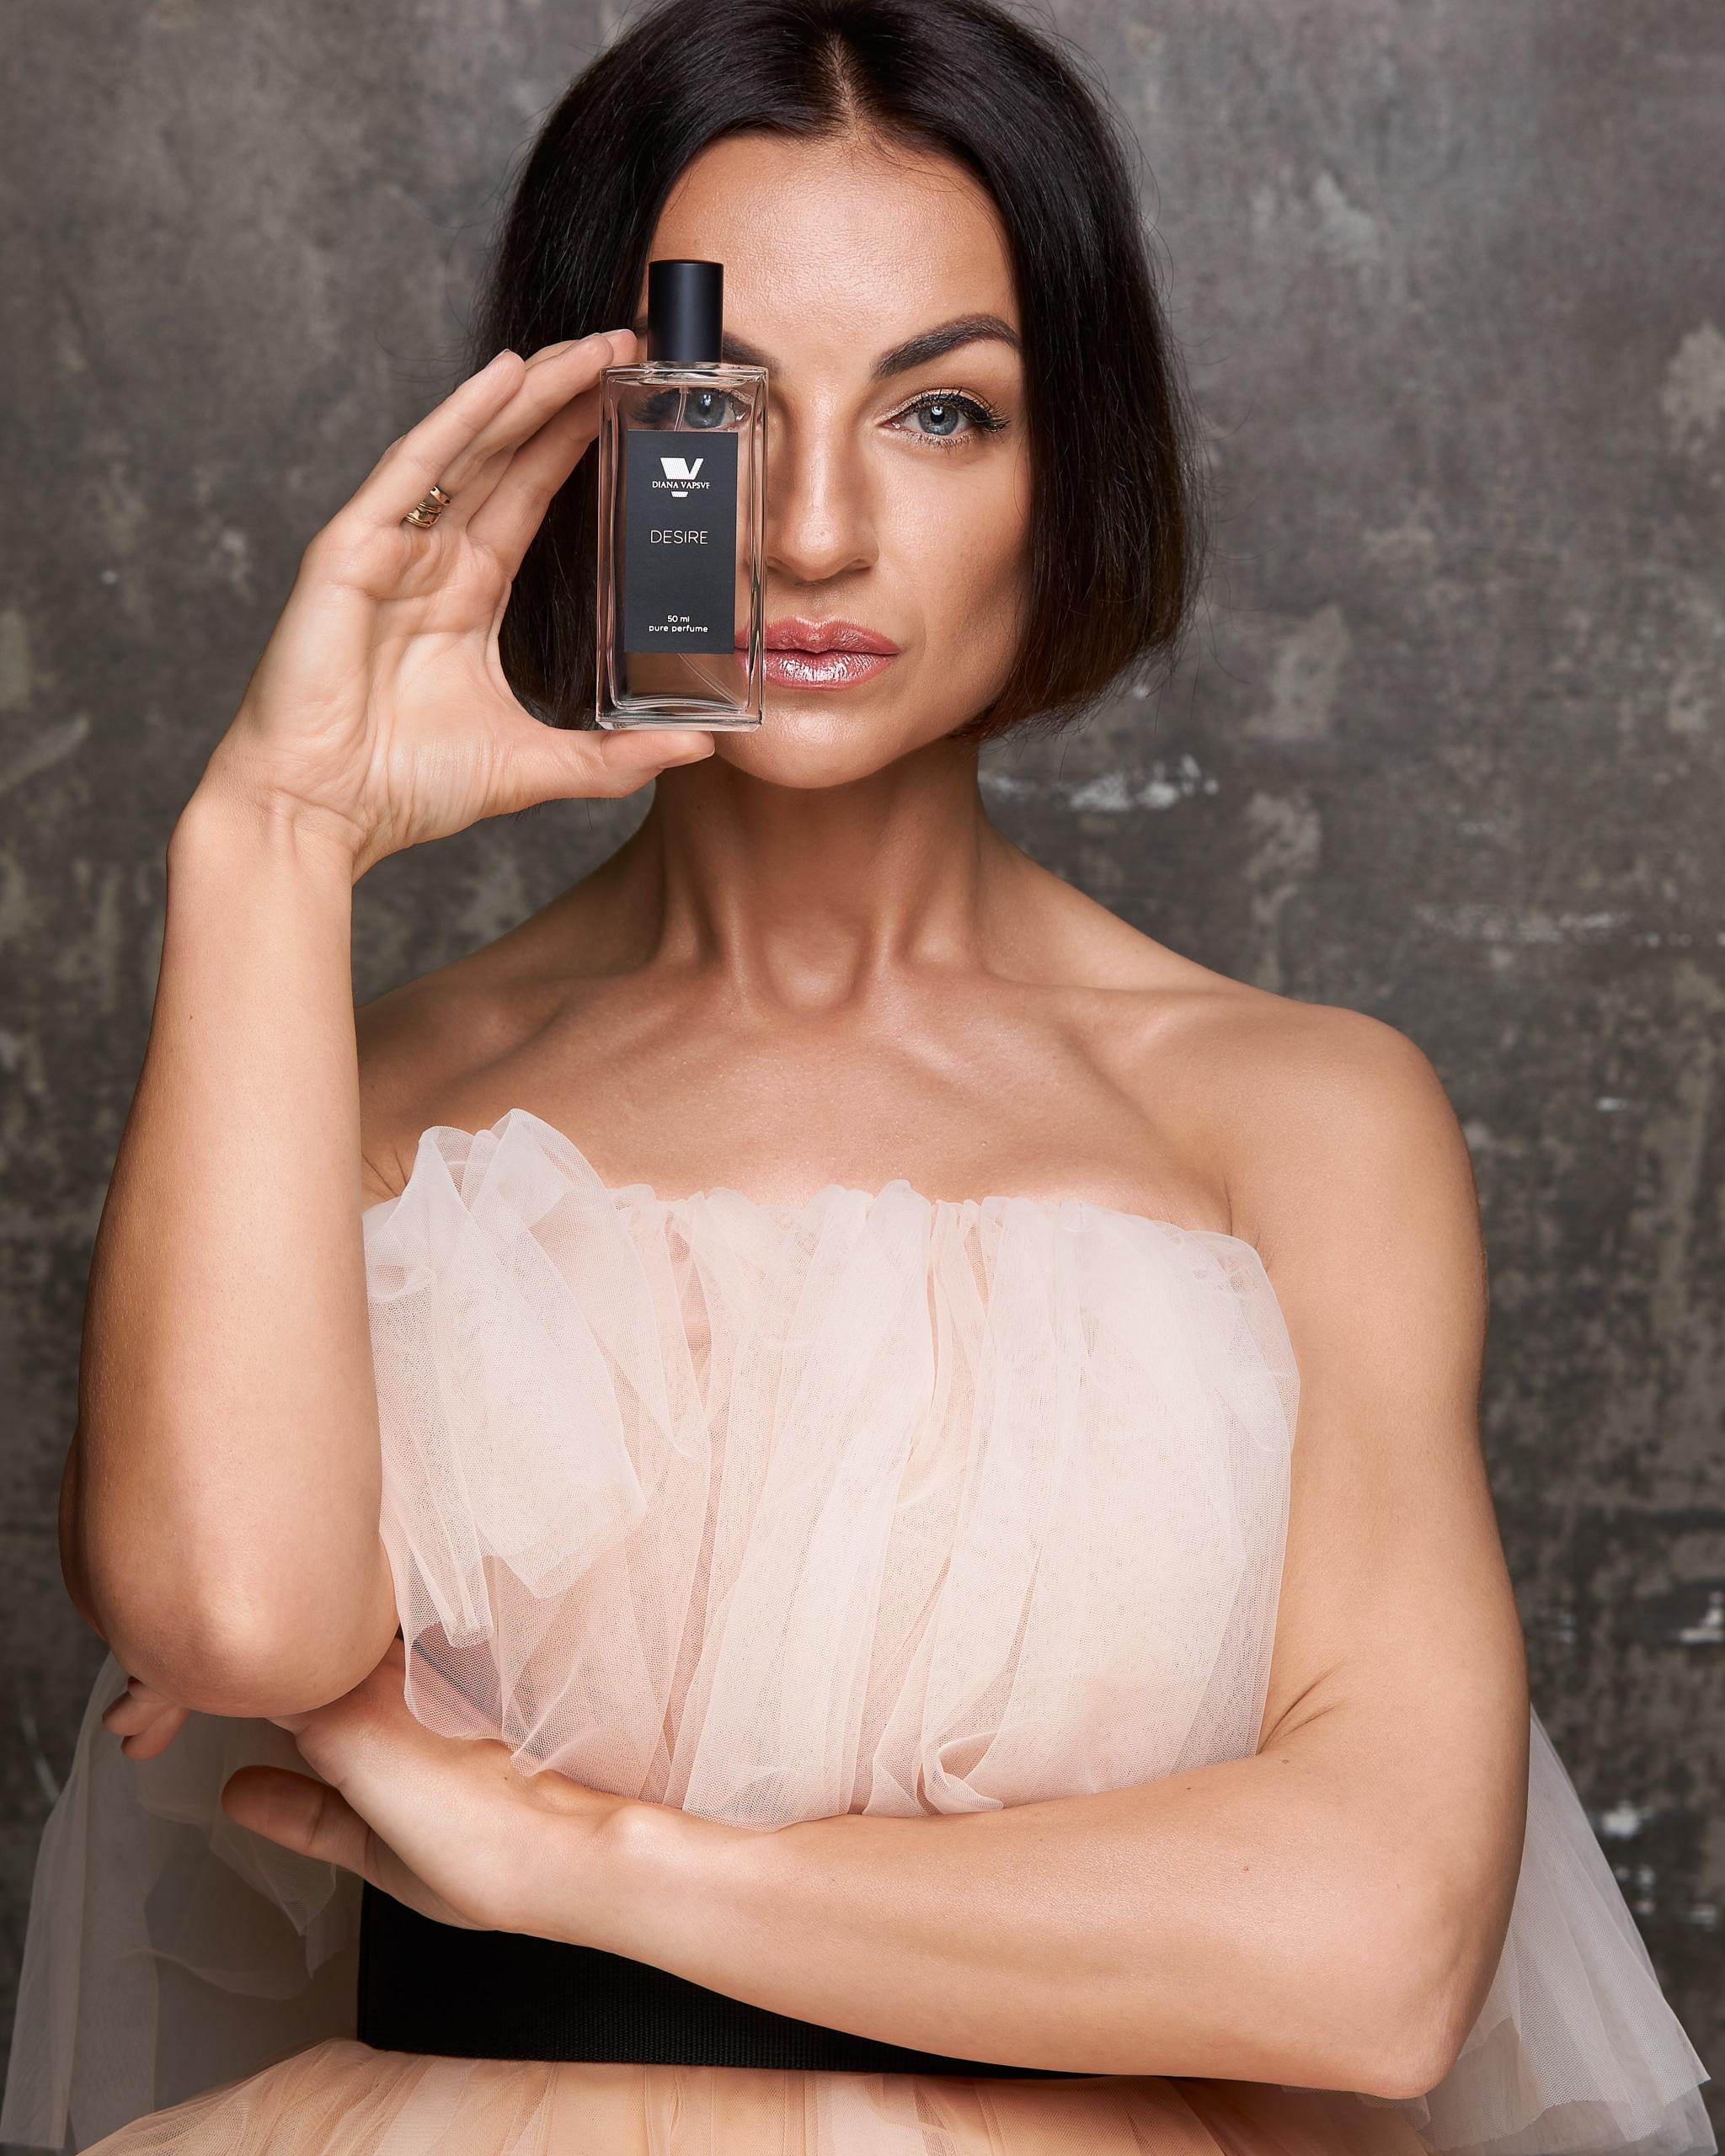 Diana Vapsve perfume